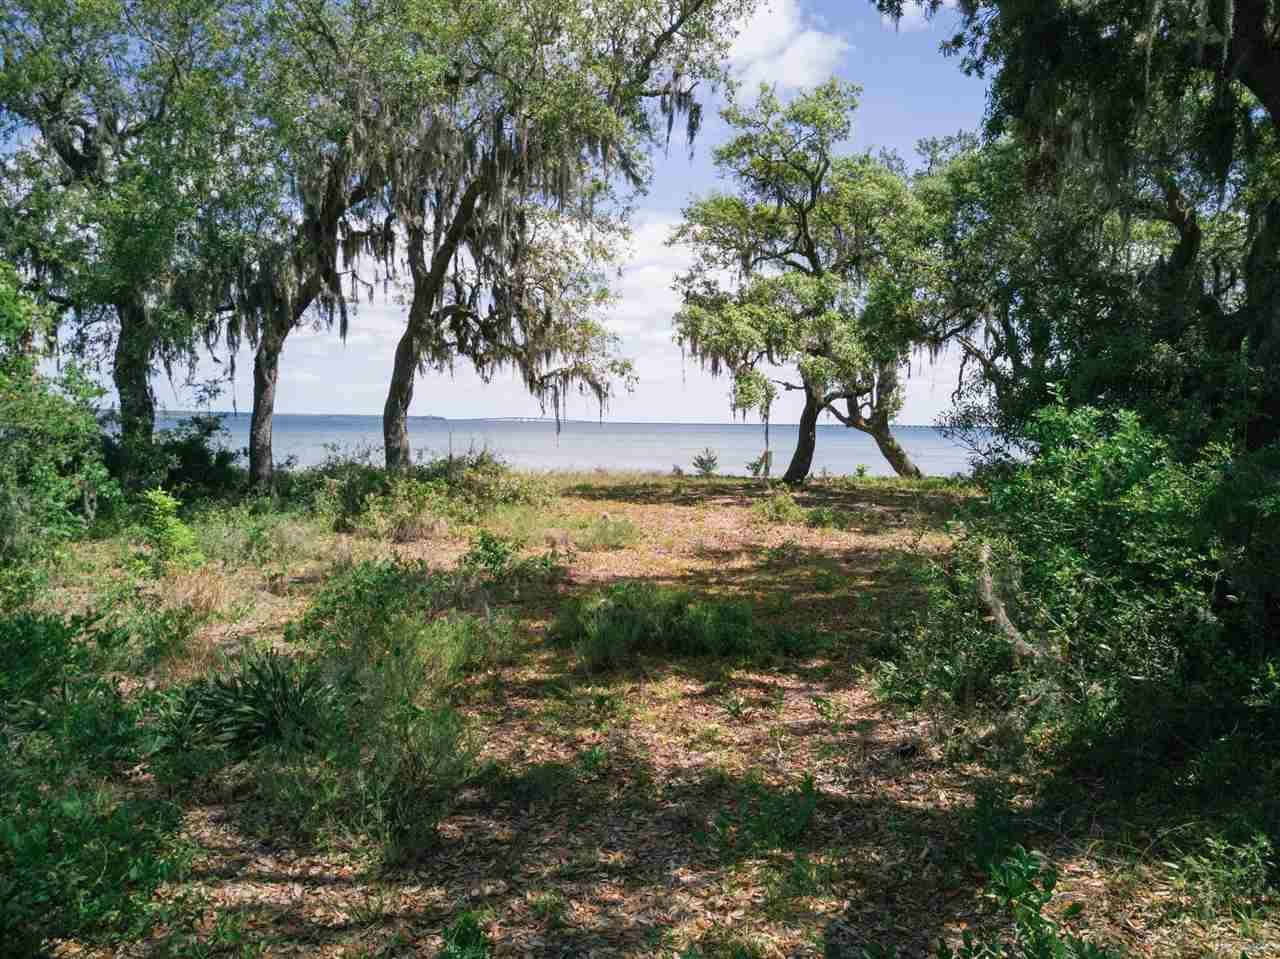 735 Peakes Point Dr, Gulf Breeze, FL 32561